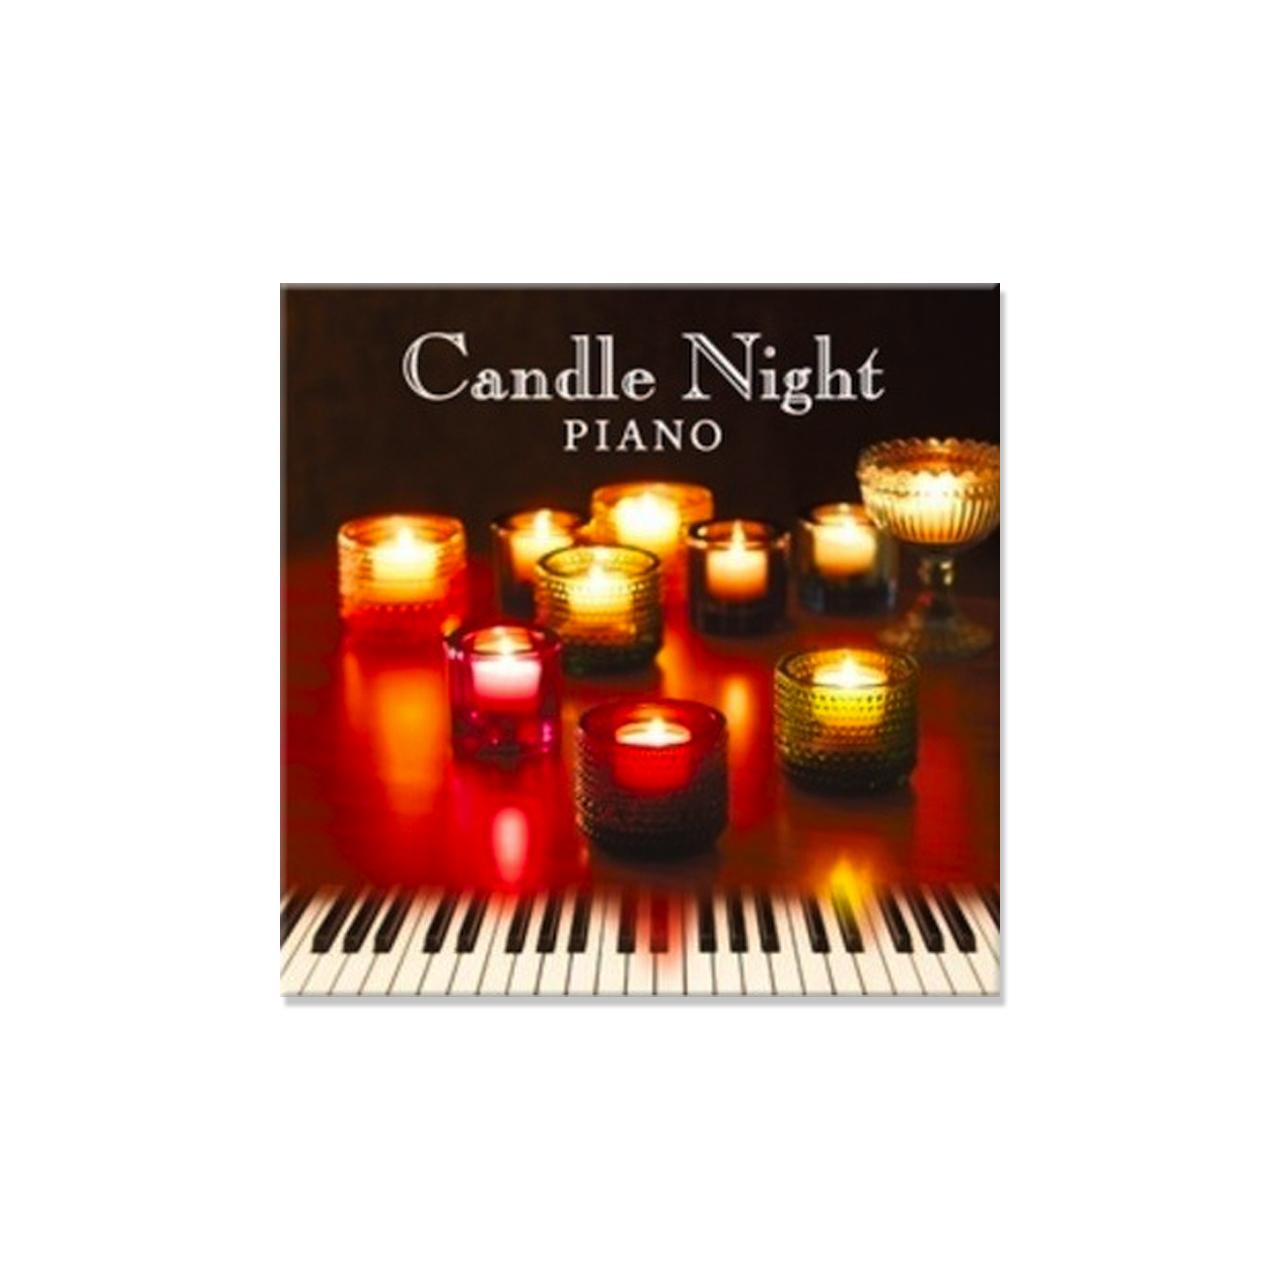 Candle Night Piano